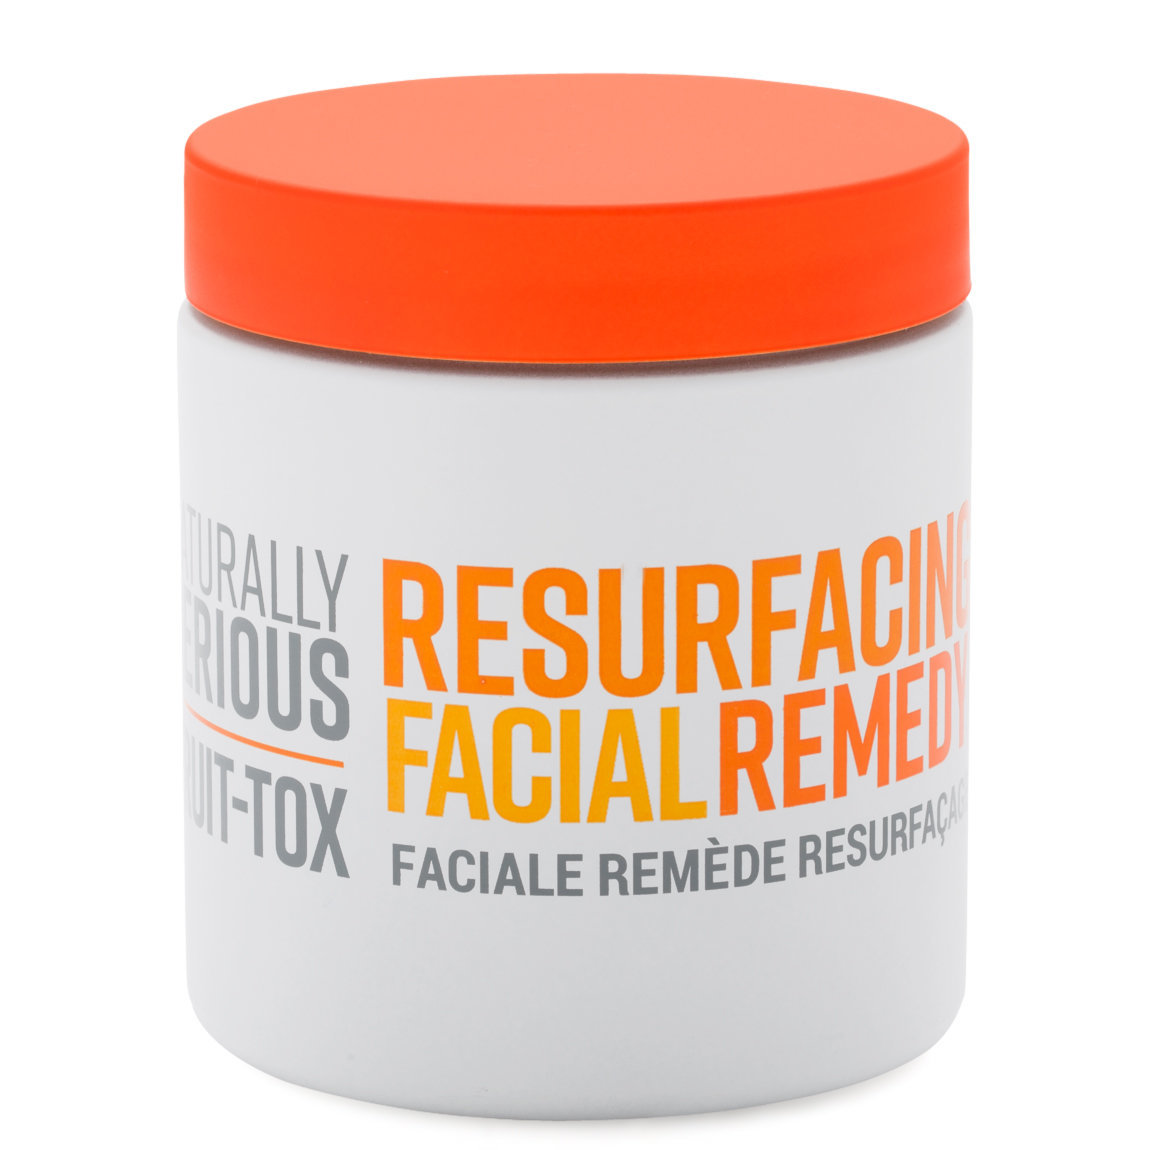 Naturally Serious Fruit-Tox Resurfacing Facial Remedy product swatch.